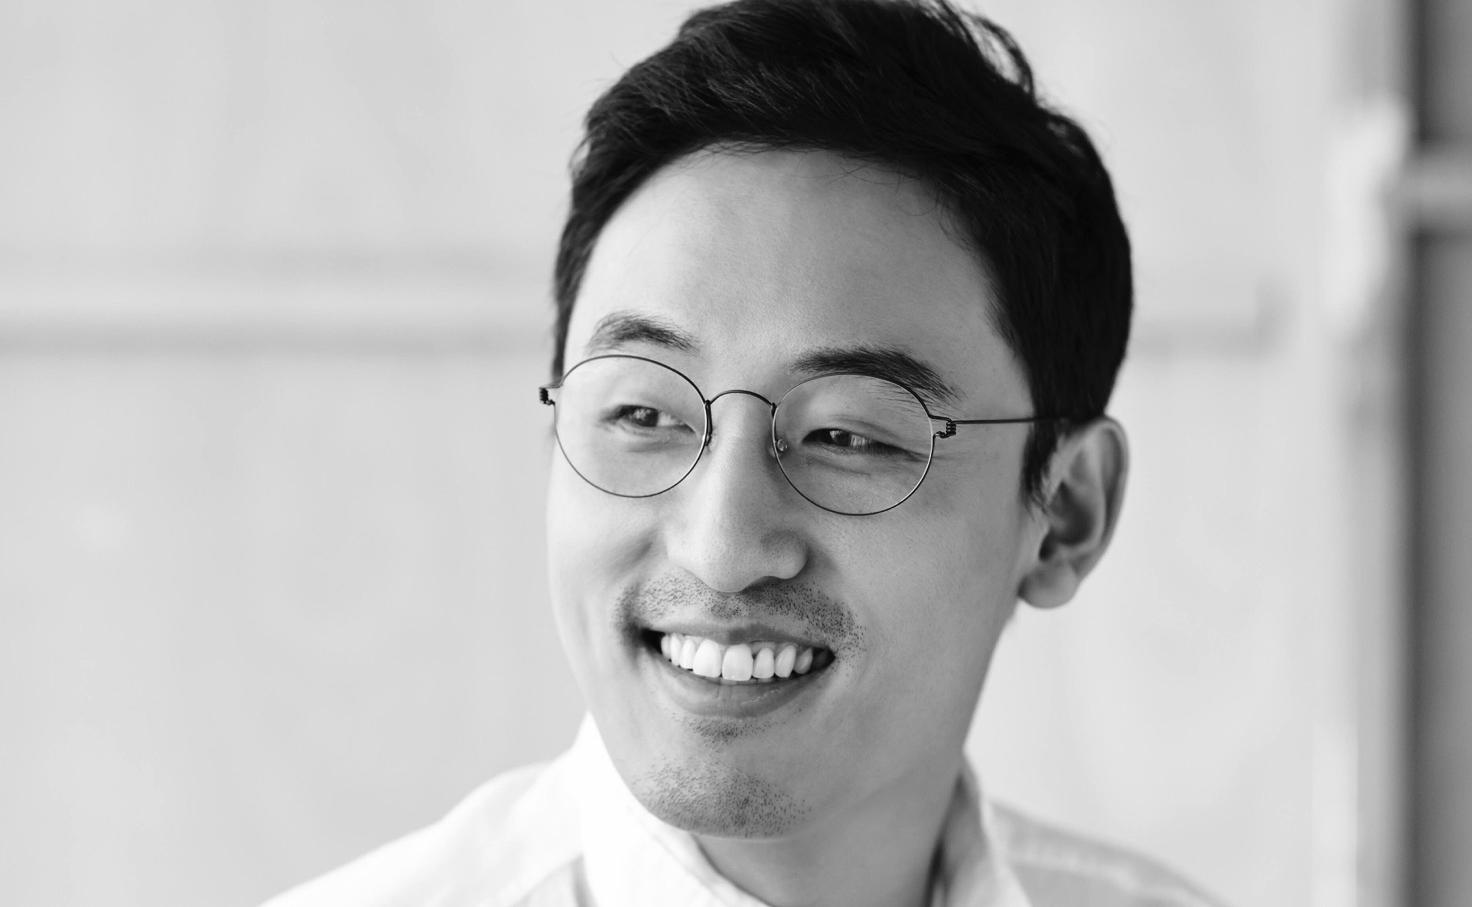 Julius-Jeongwon Kim • Klavier